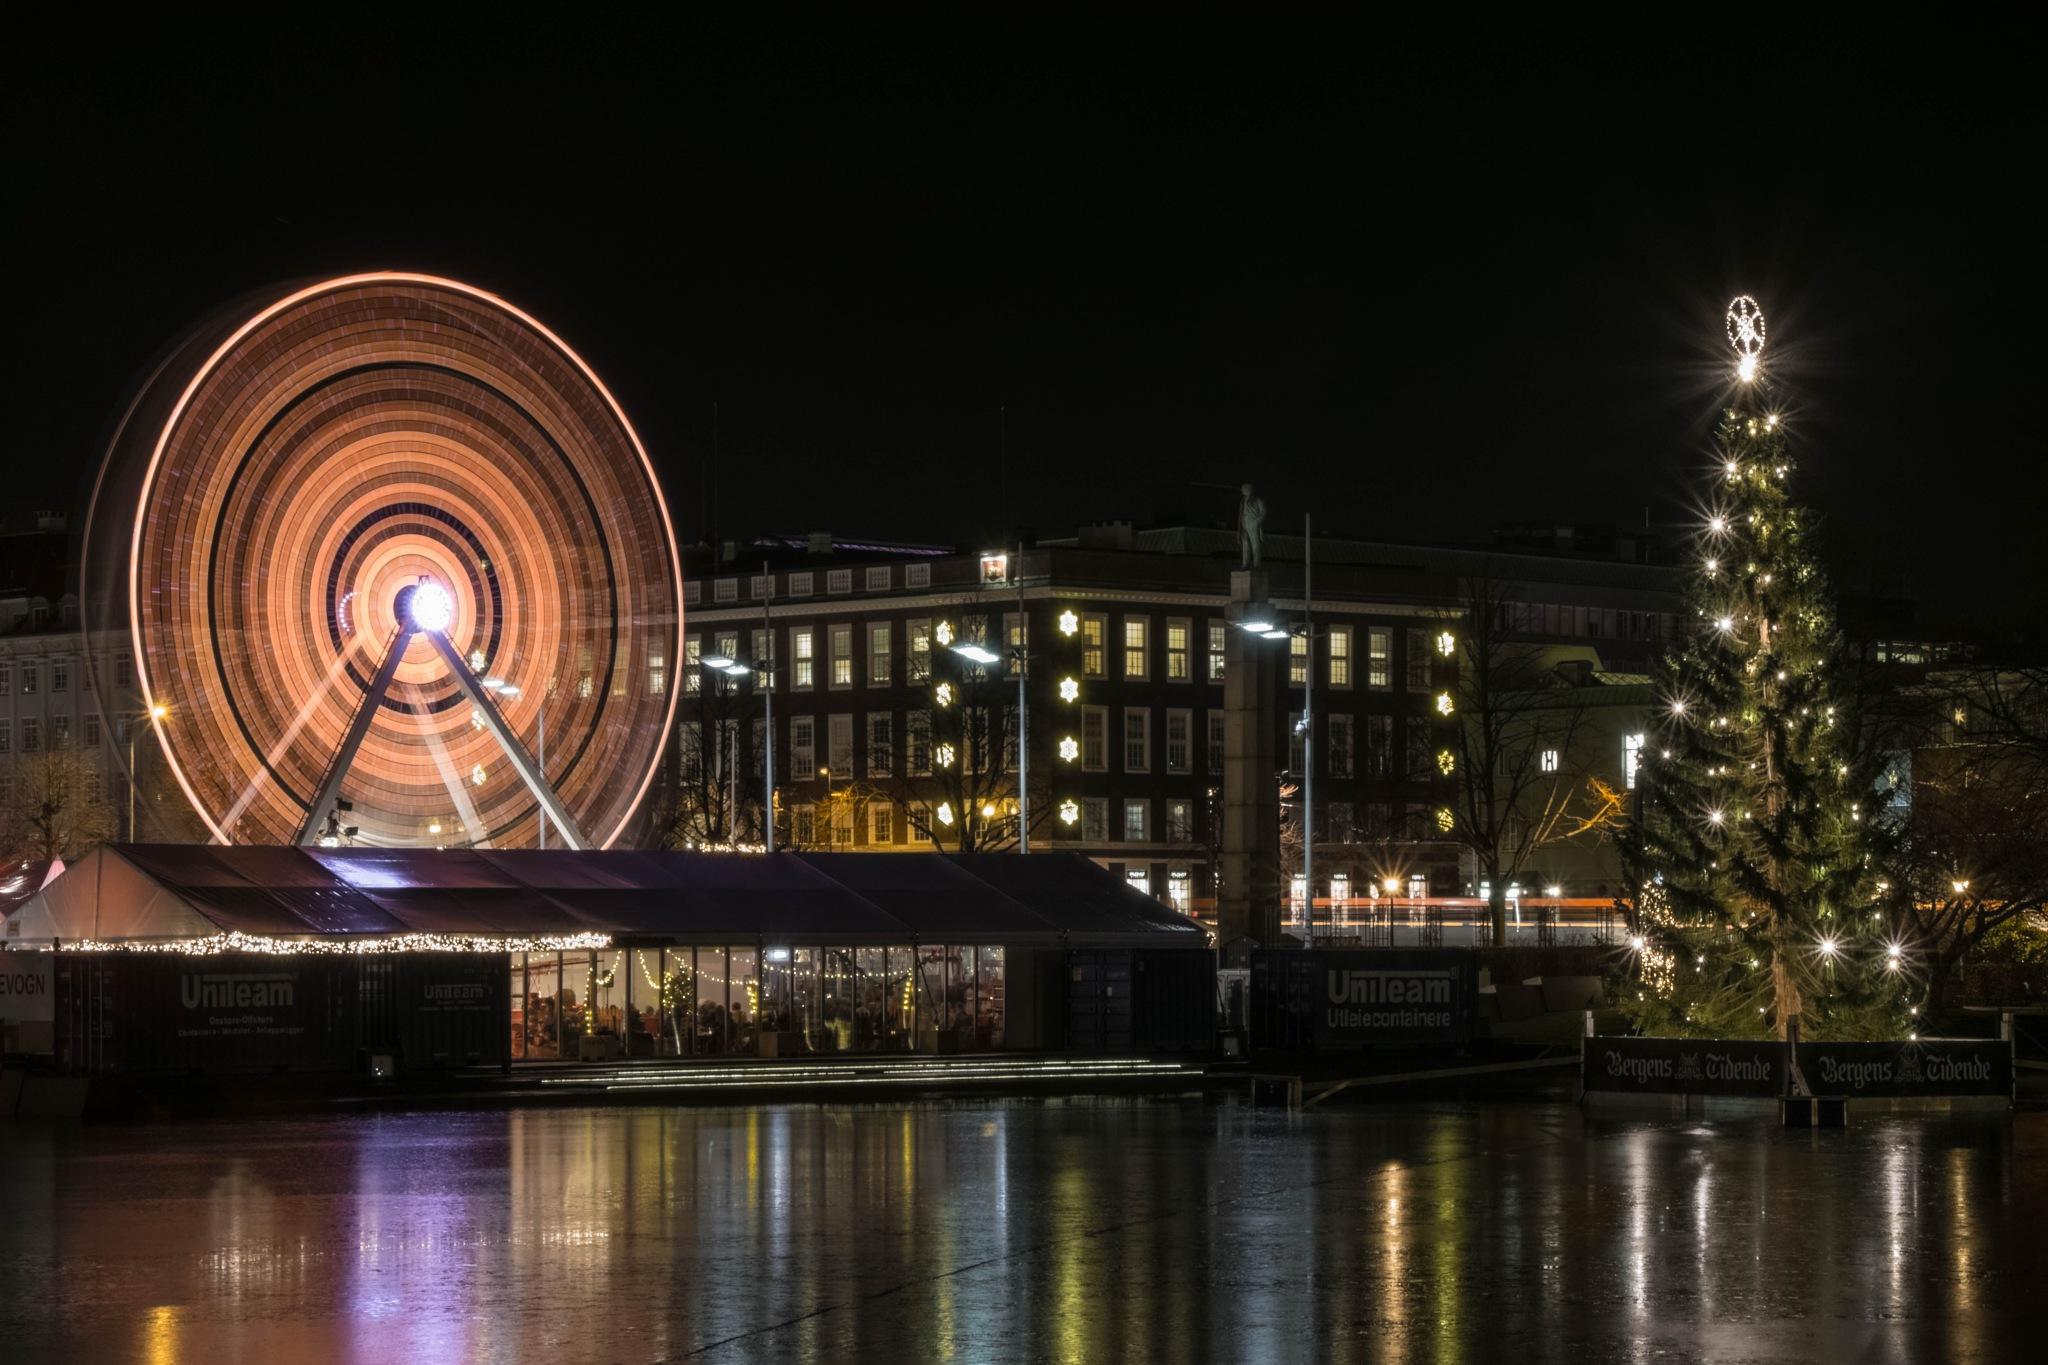 Pariserhjul, Bergen by MjollnirMacAlba